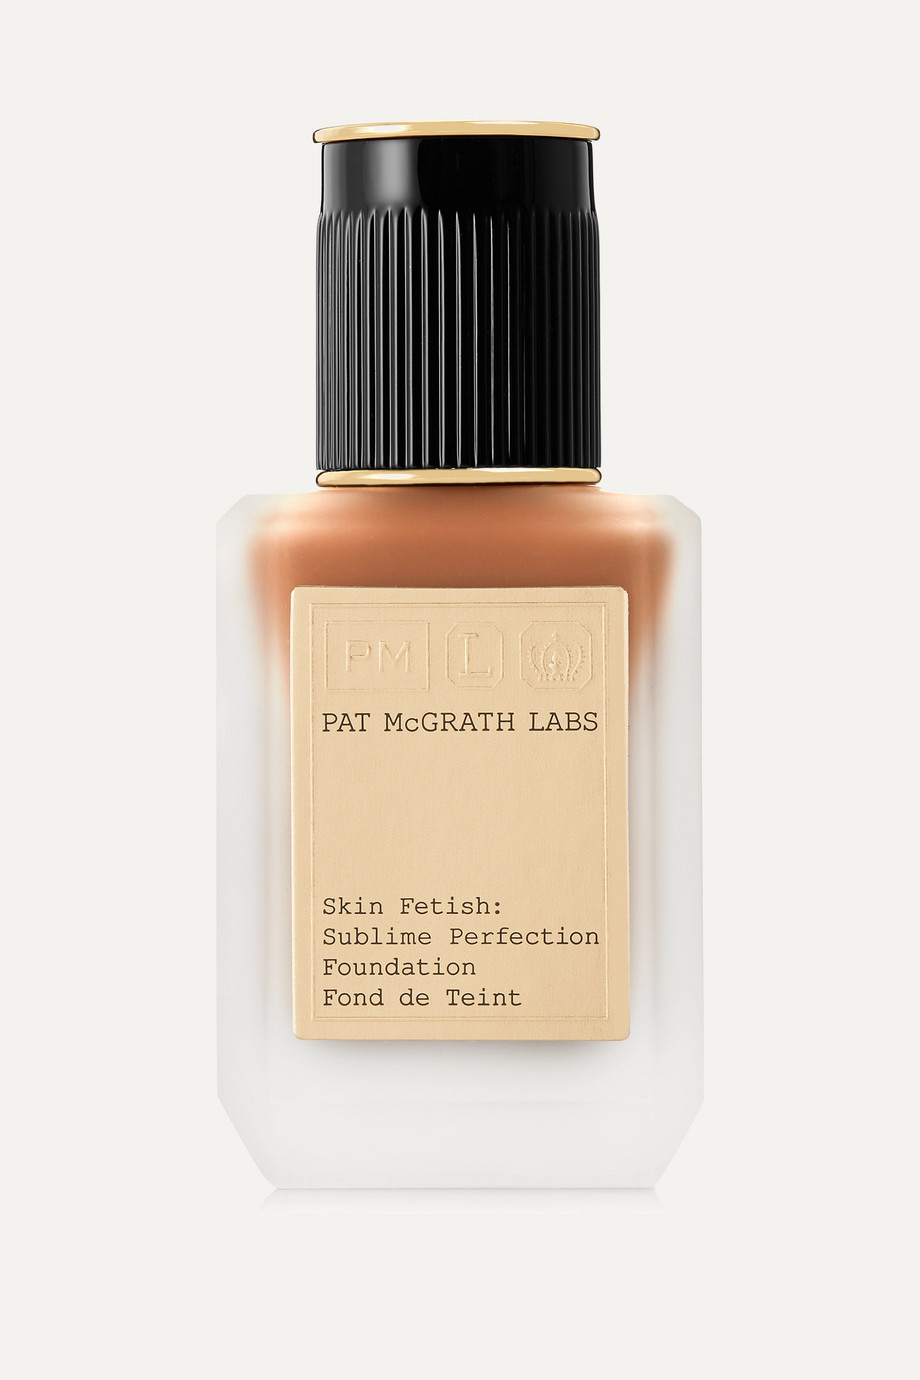 Pat McGrath Labs Skin Fetish: Sublime Perfection Foundation - Medium Deep 25, 35ml